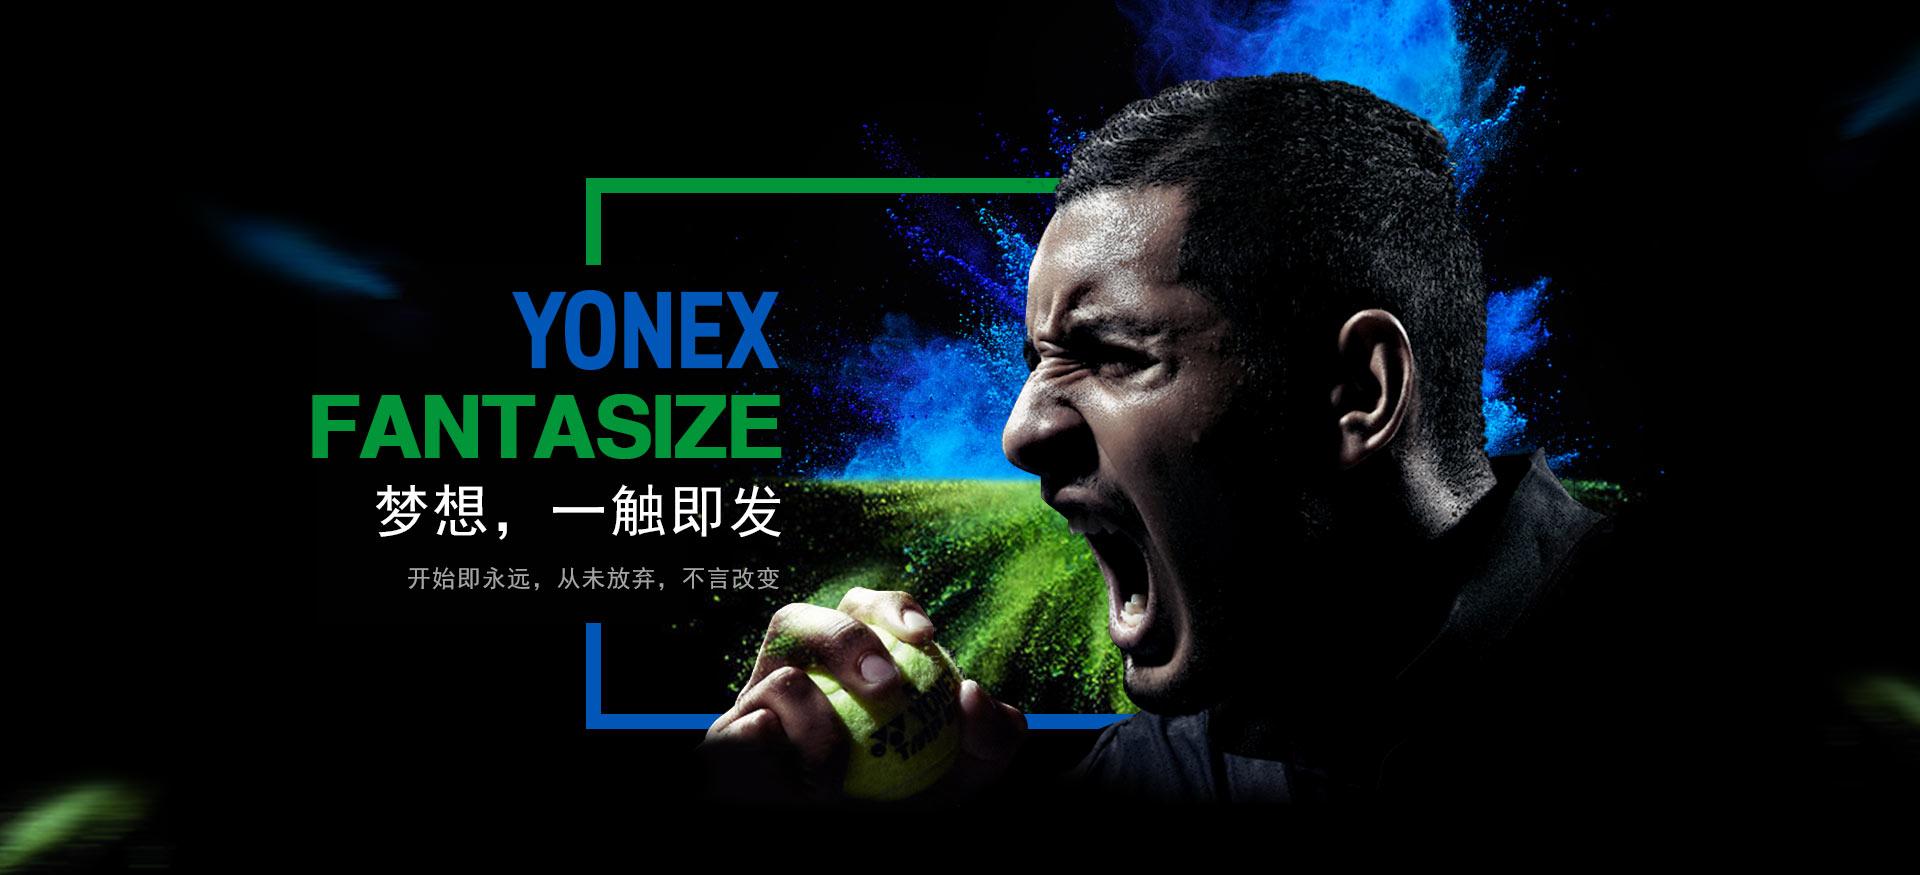 网球选手列表banner